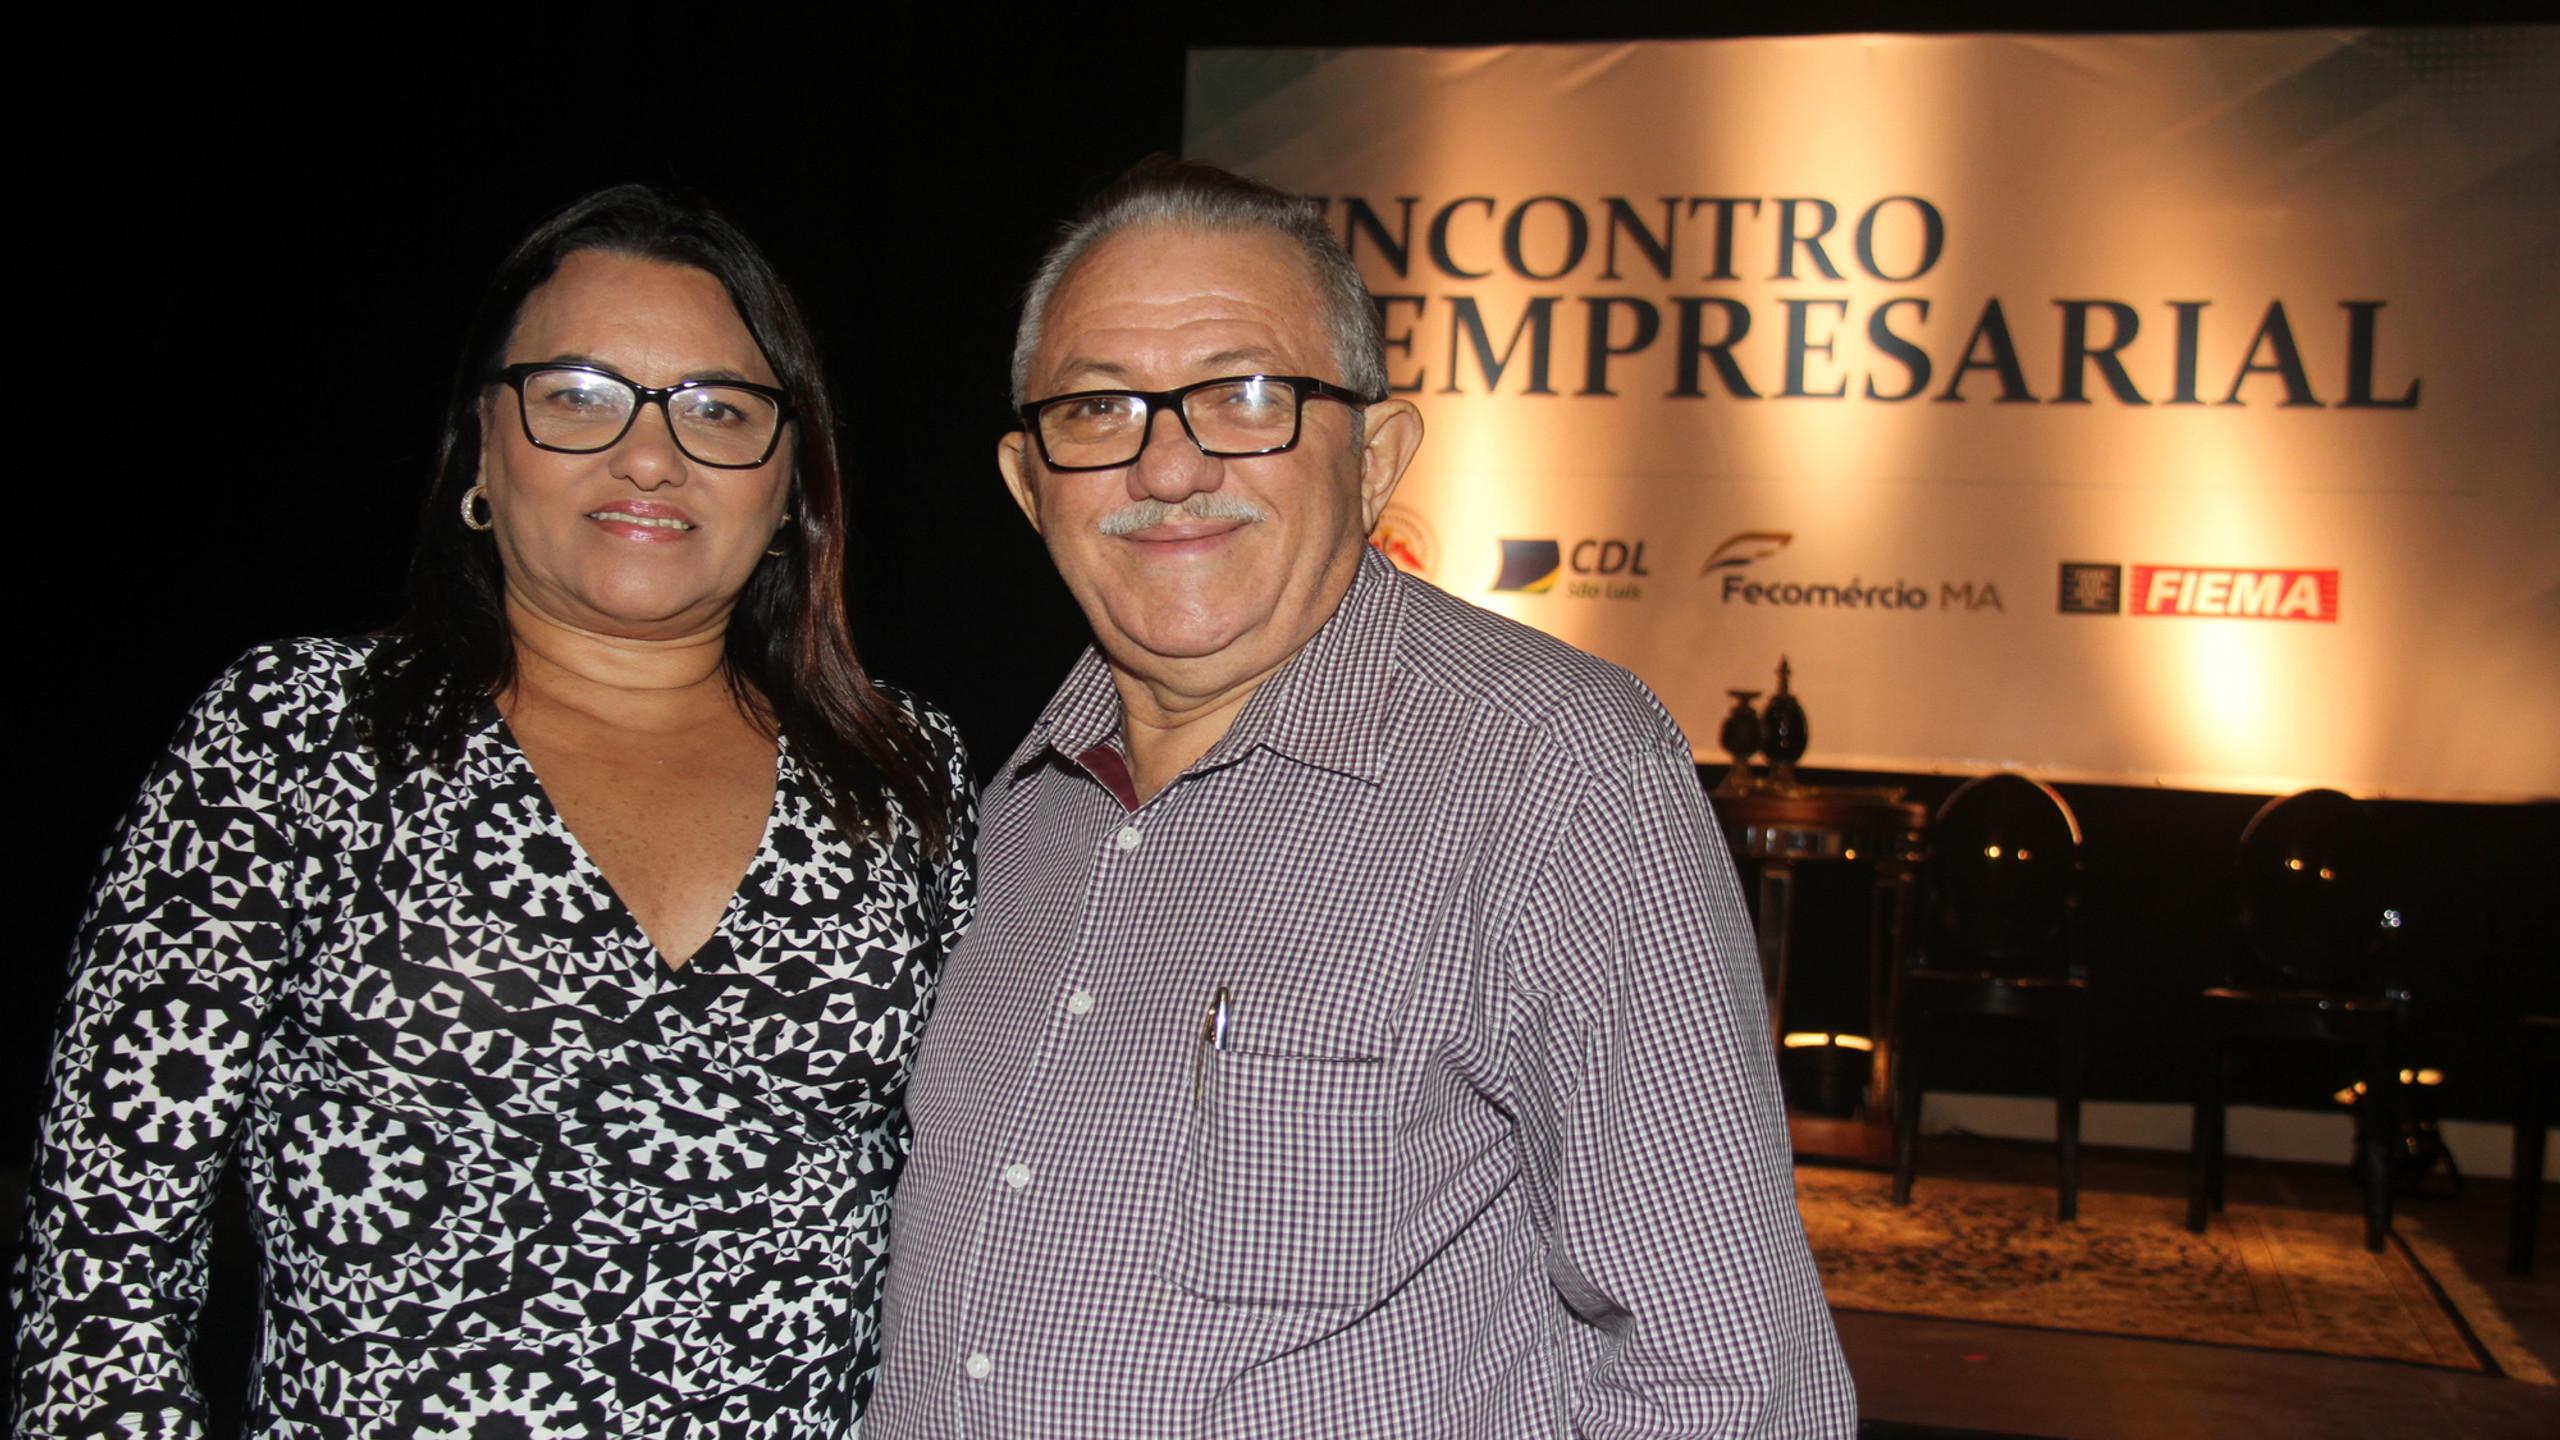 Socorro Noronha, Pres. da FCDL-MA e Antonio Fróes, assessor da CDL SLZ.